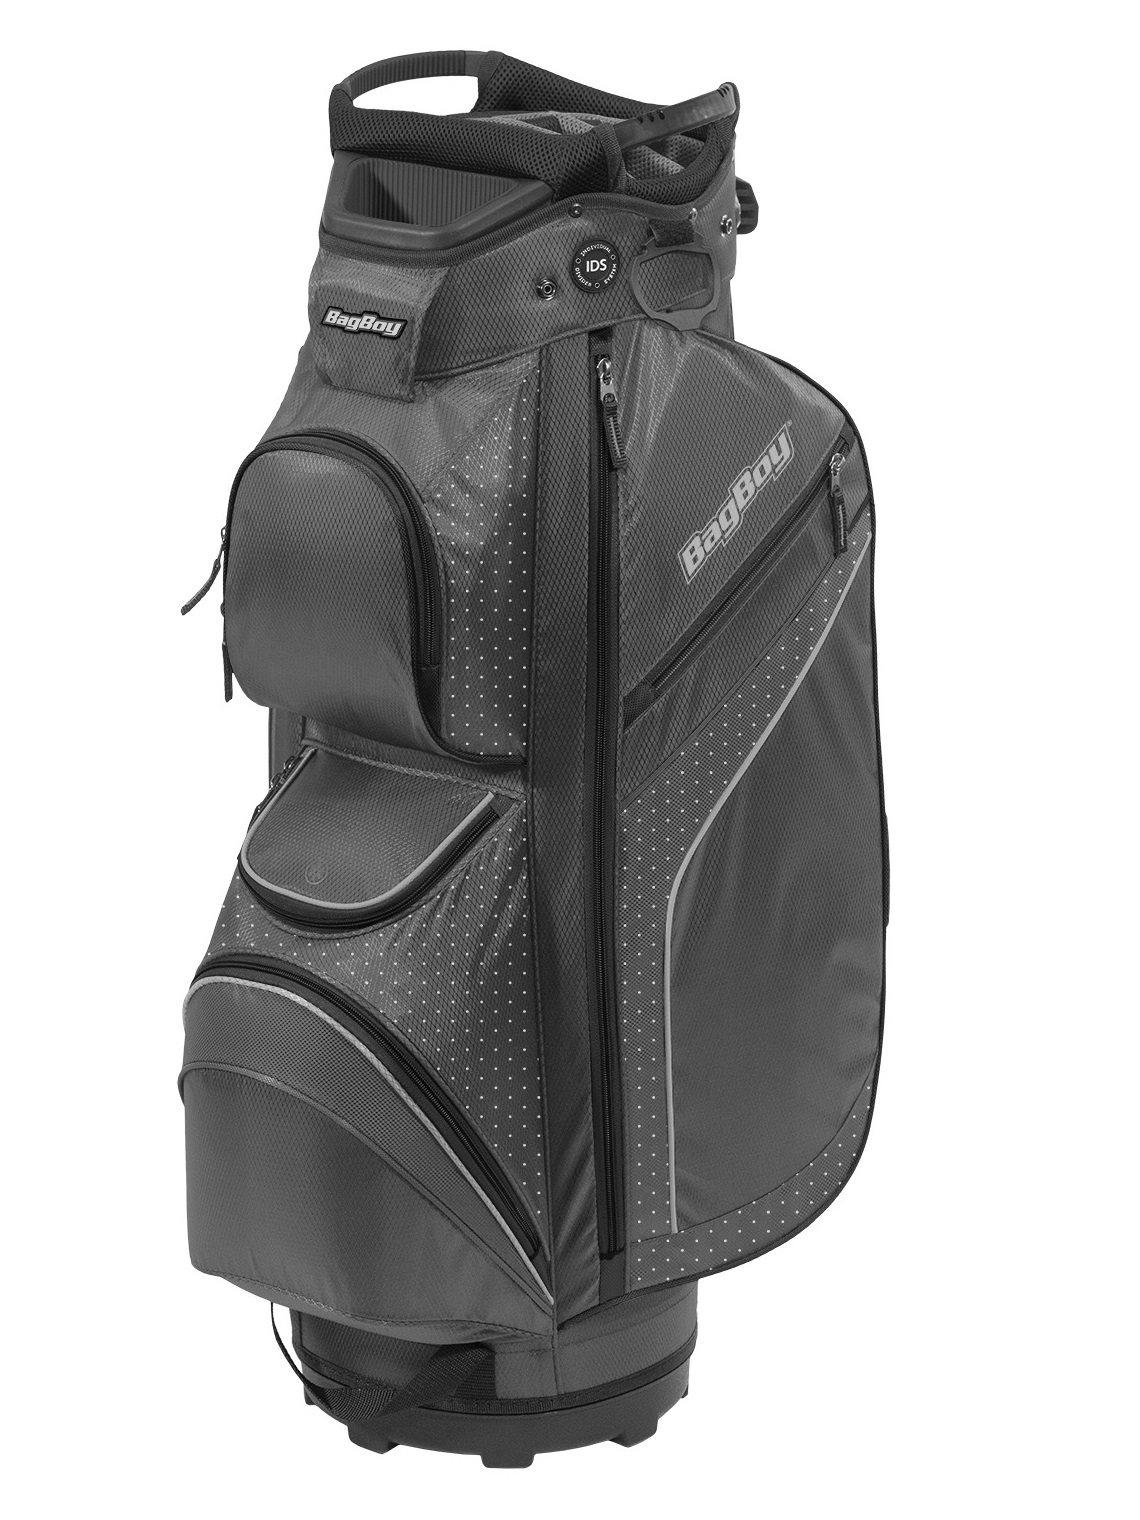 BagBoy golftas DG-Lite II TL Cart Bag grijs-zwart-witte stippen